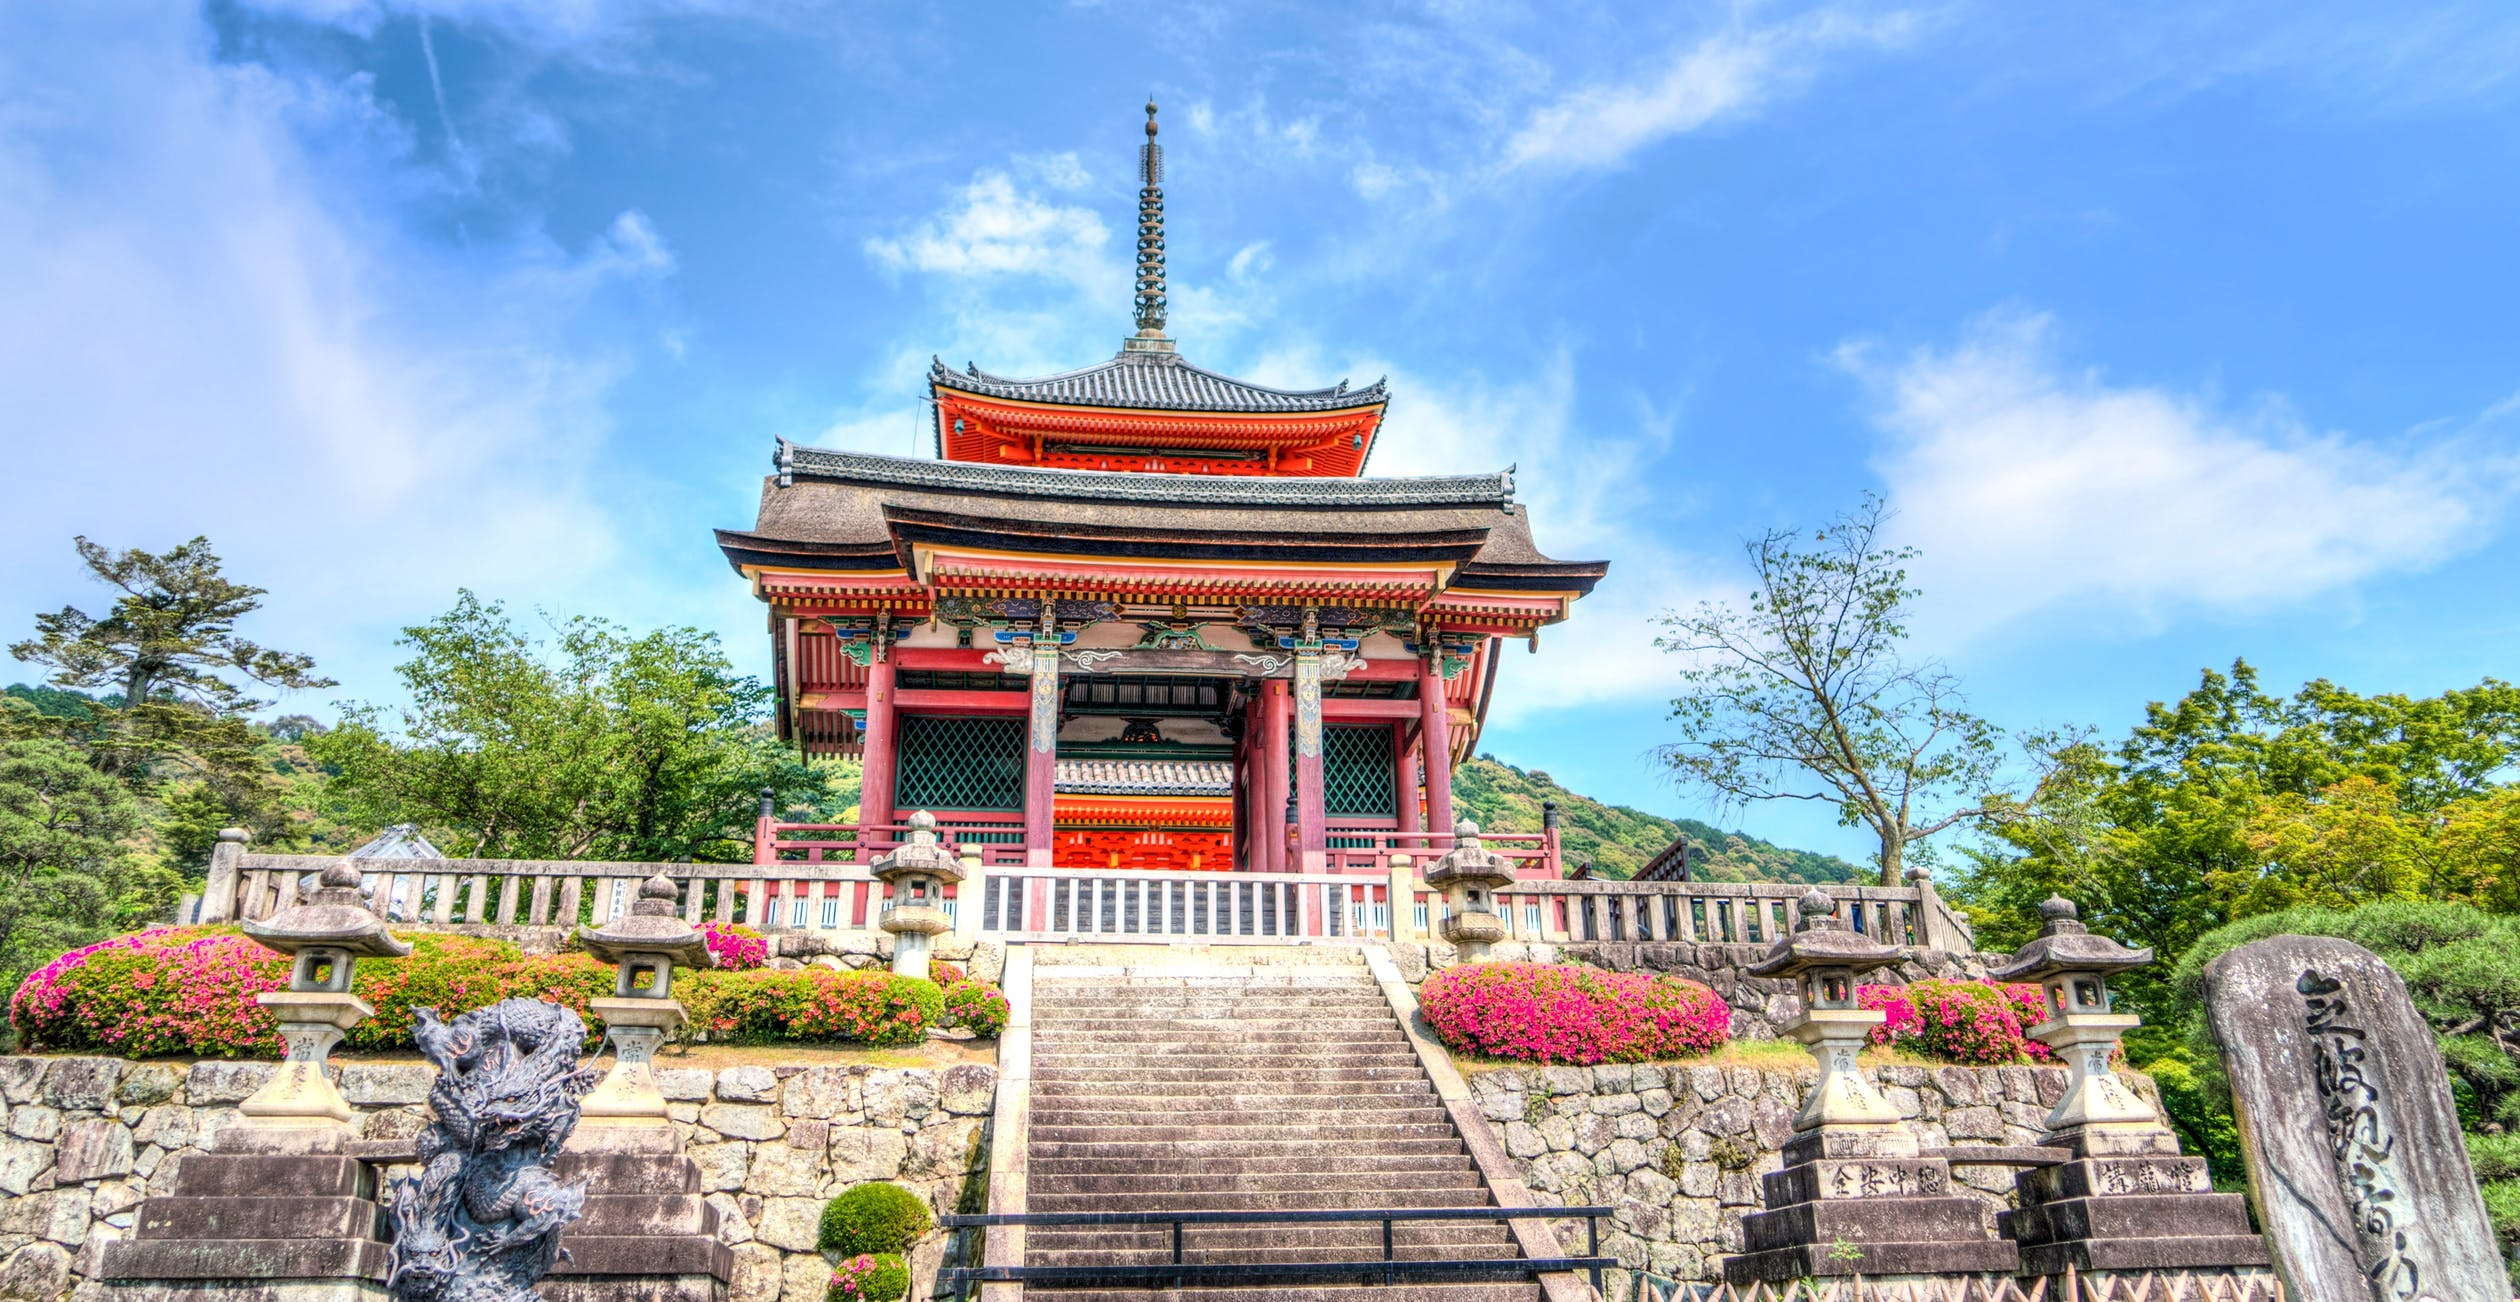 Kiyomizu-dera Temple in Kyoto, a UNESCO World Heritage Site